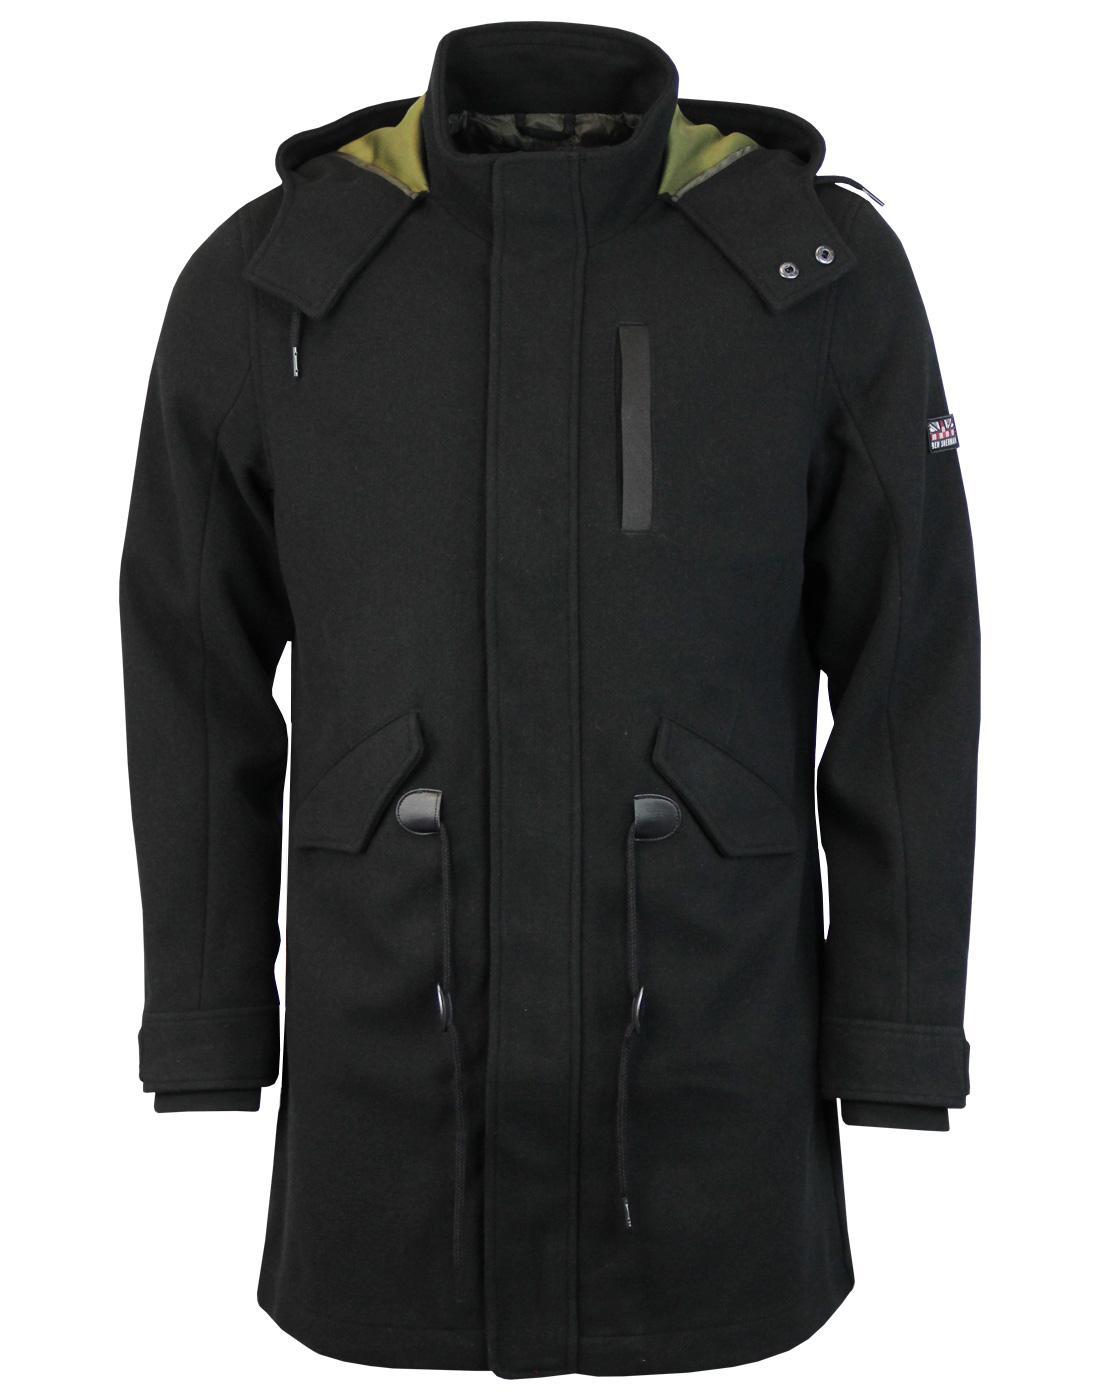 BEN SHERMAN Retro Mod Bonded Wool Parka Jacket (B)